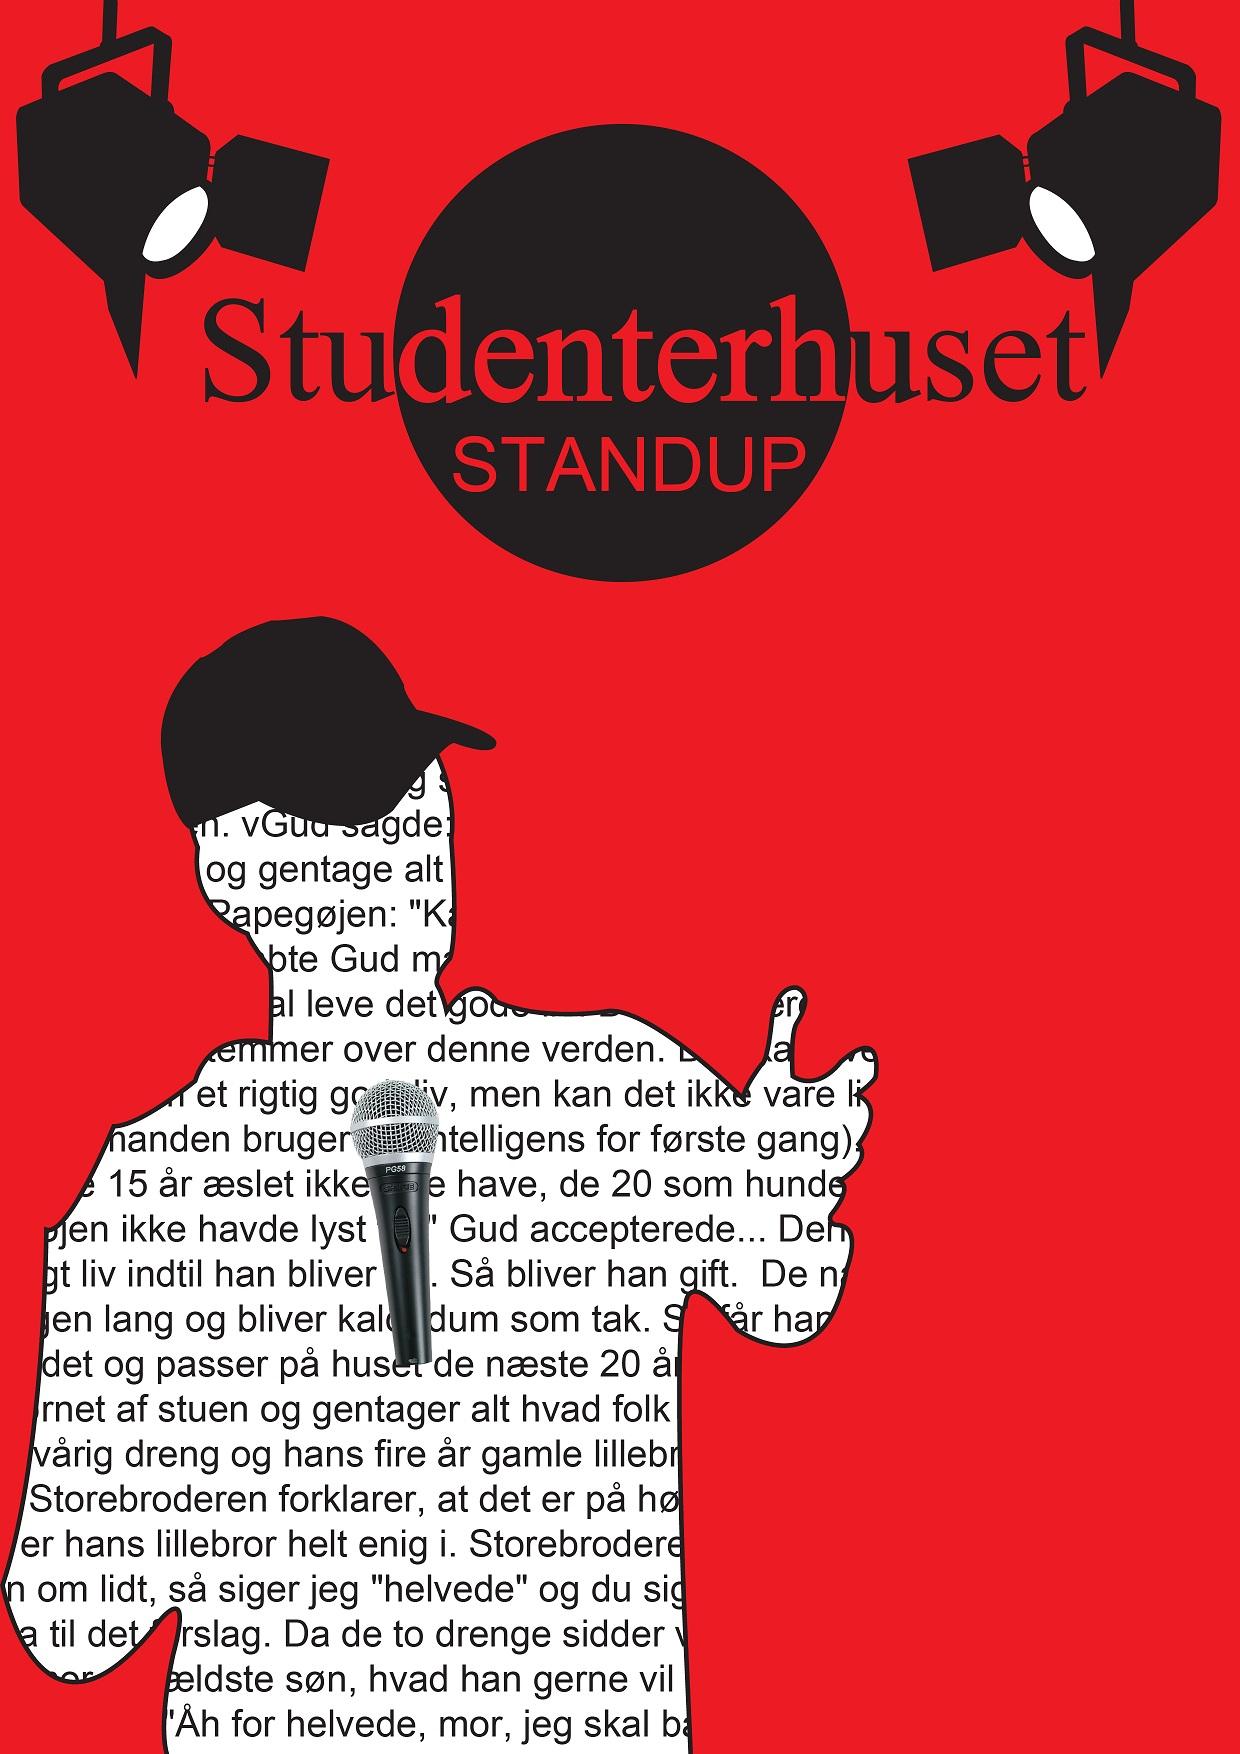 Standup poster